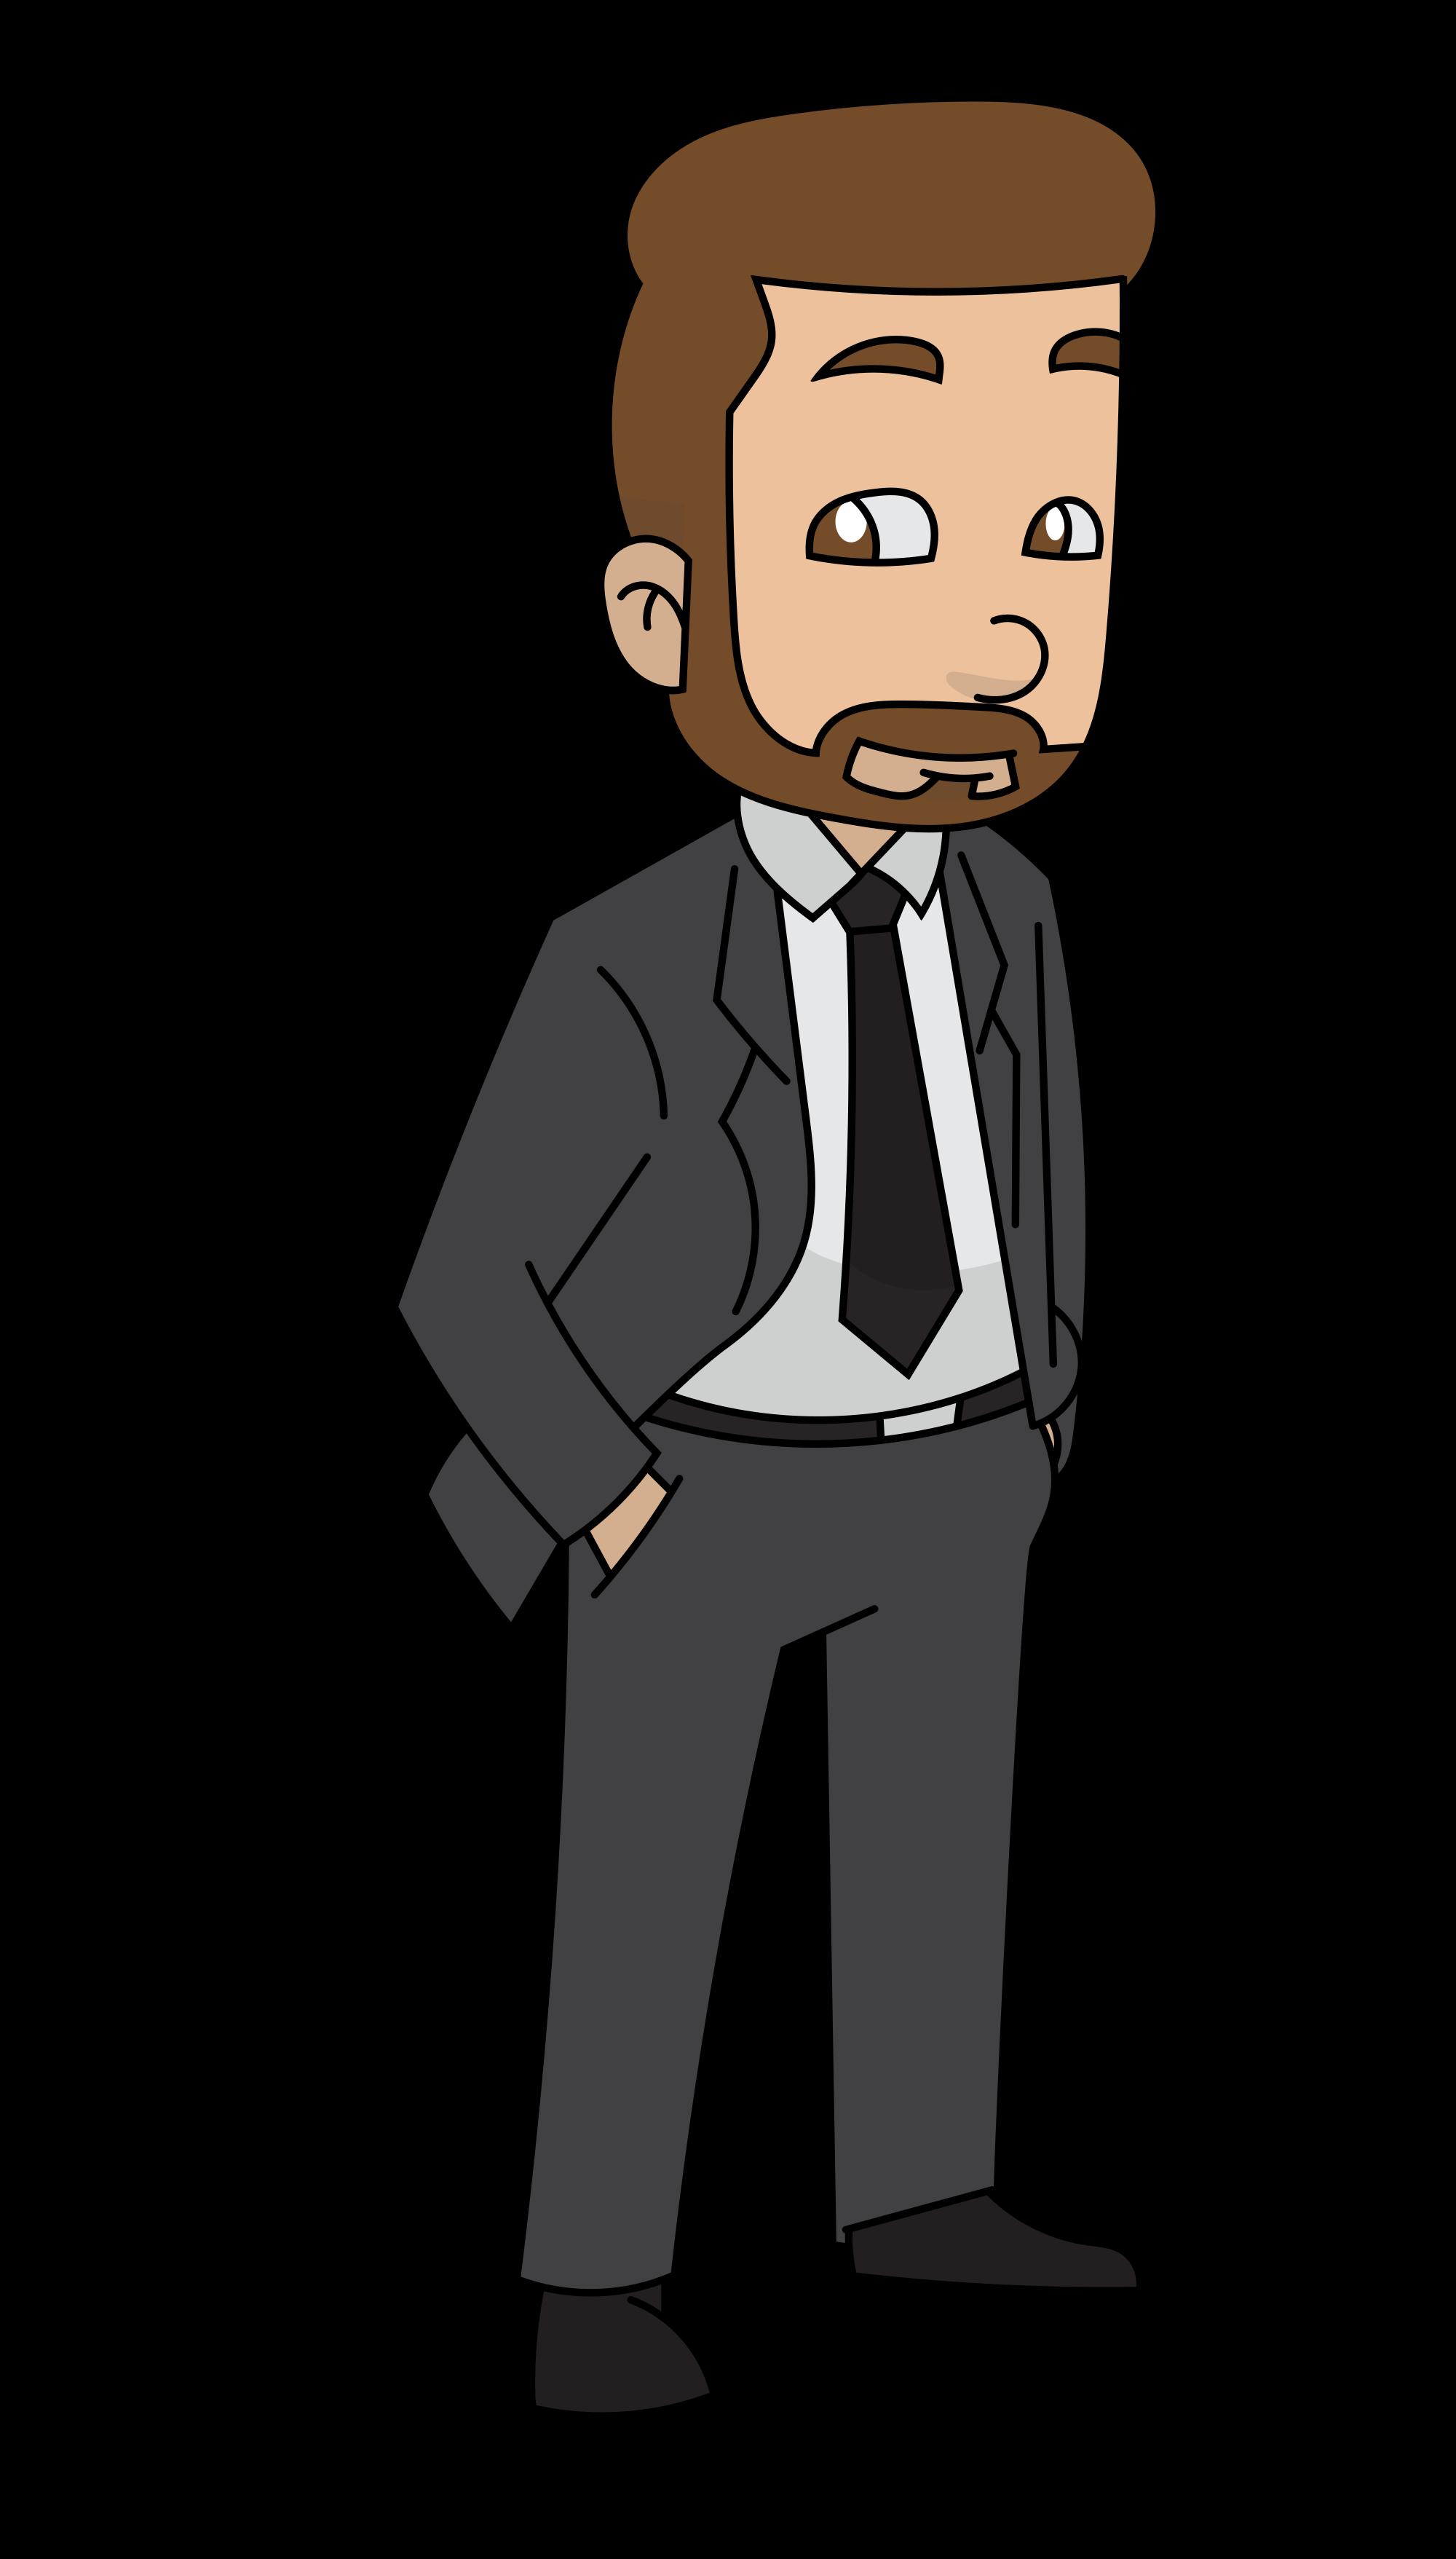 clipart royalty free Beard clipart svg. File a cartoon businessman